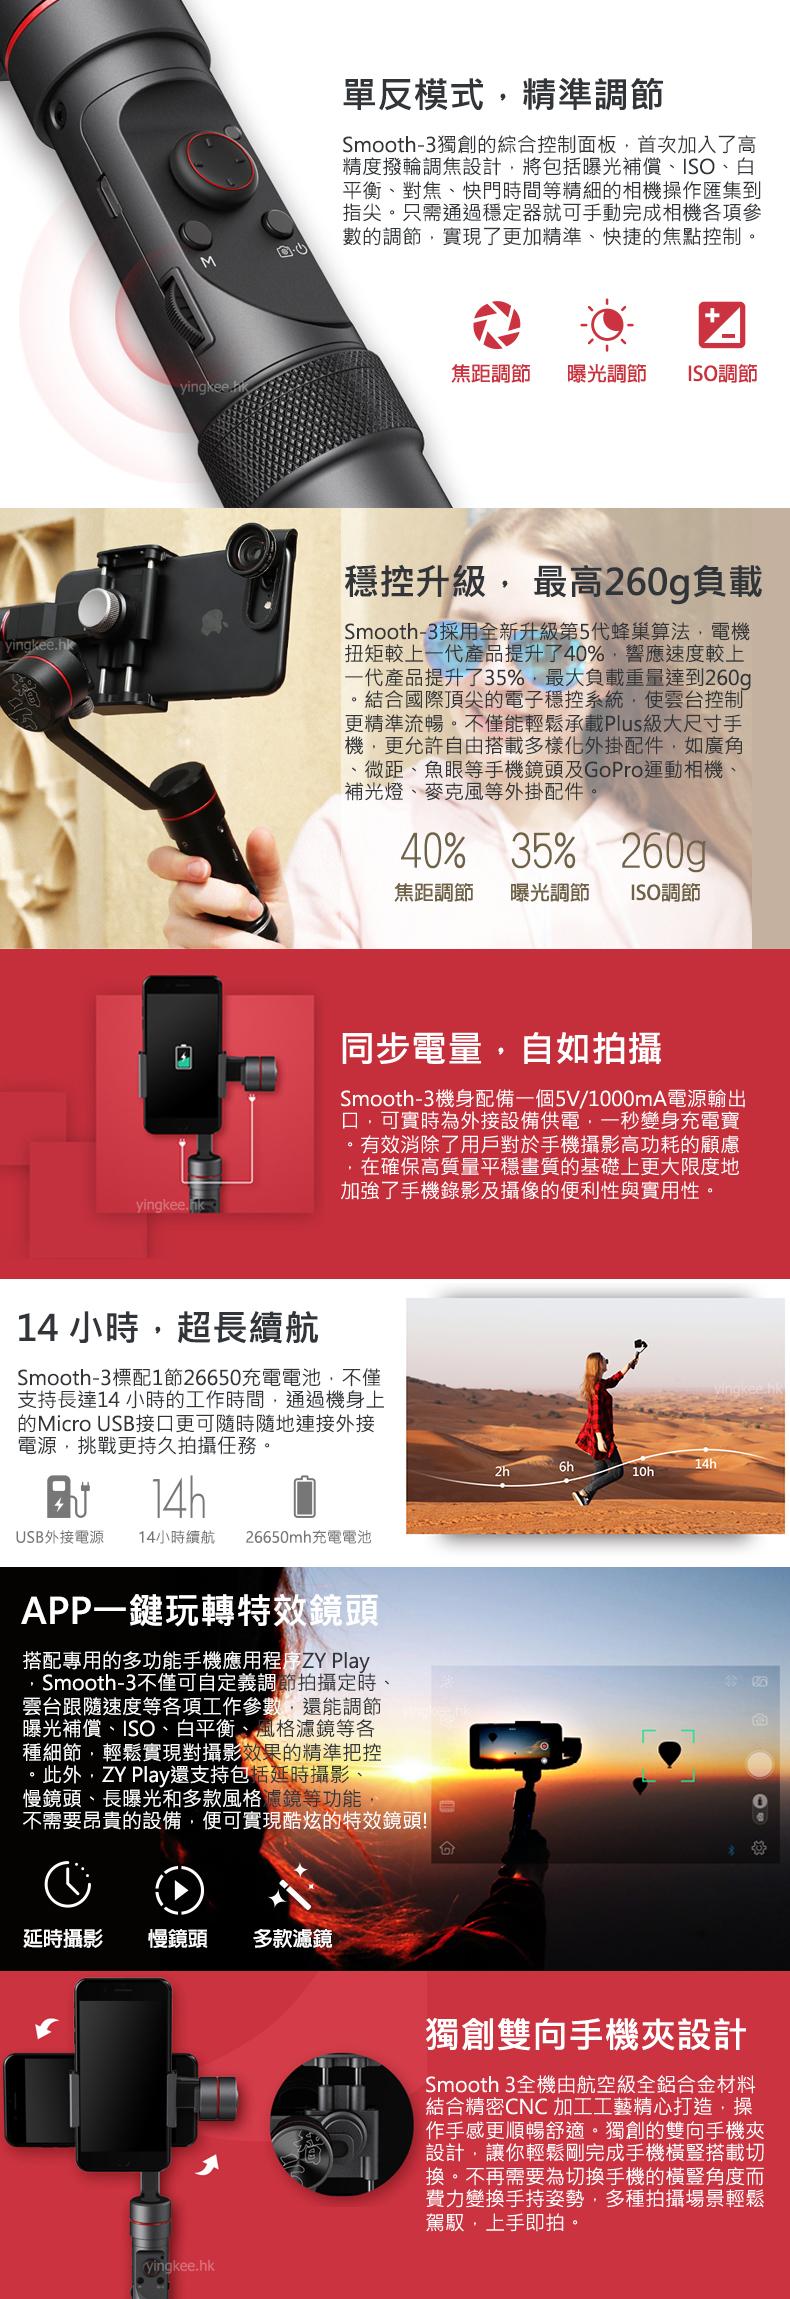 zhiyun-smooth-3-introductory-yingkee.jpg